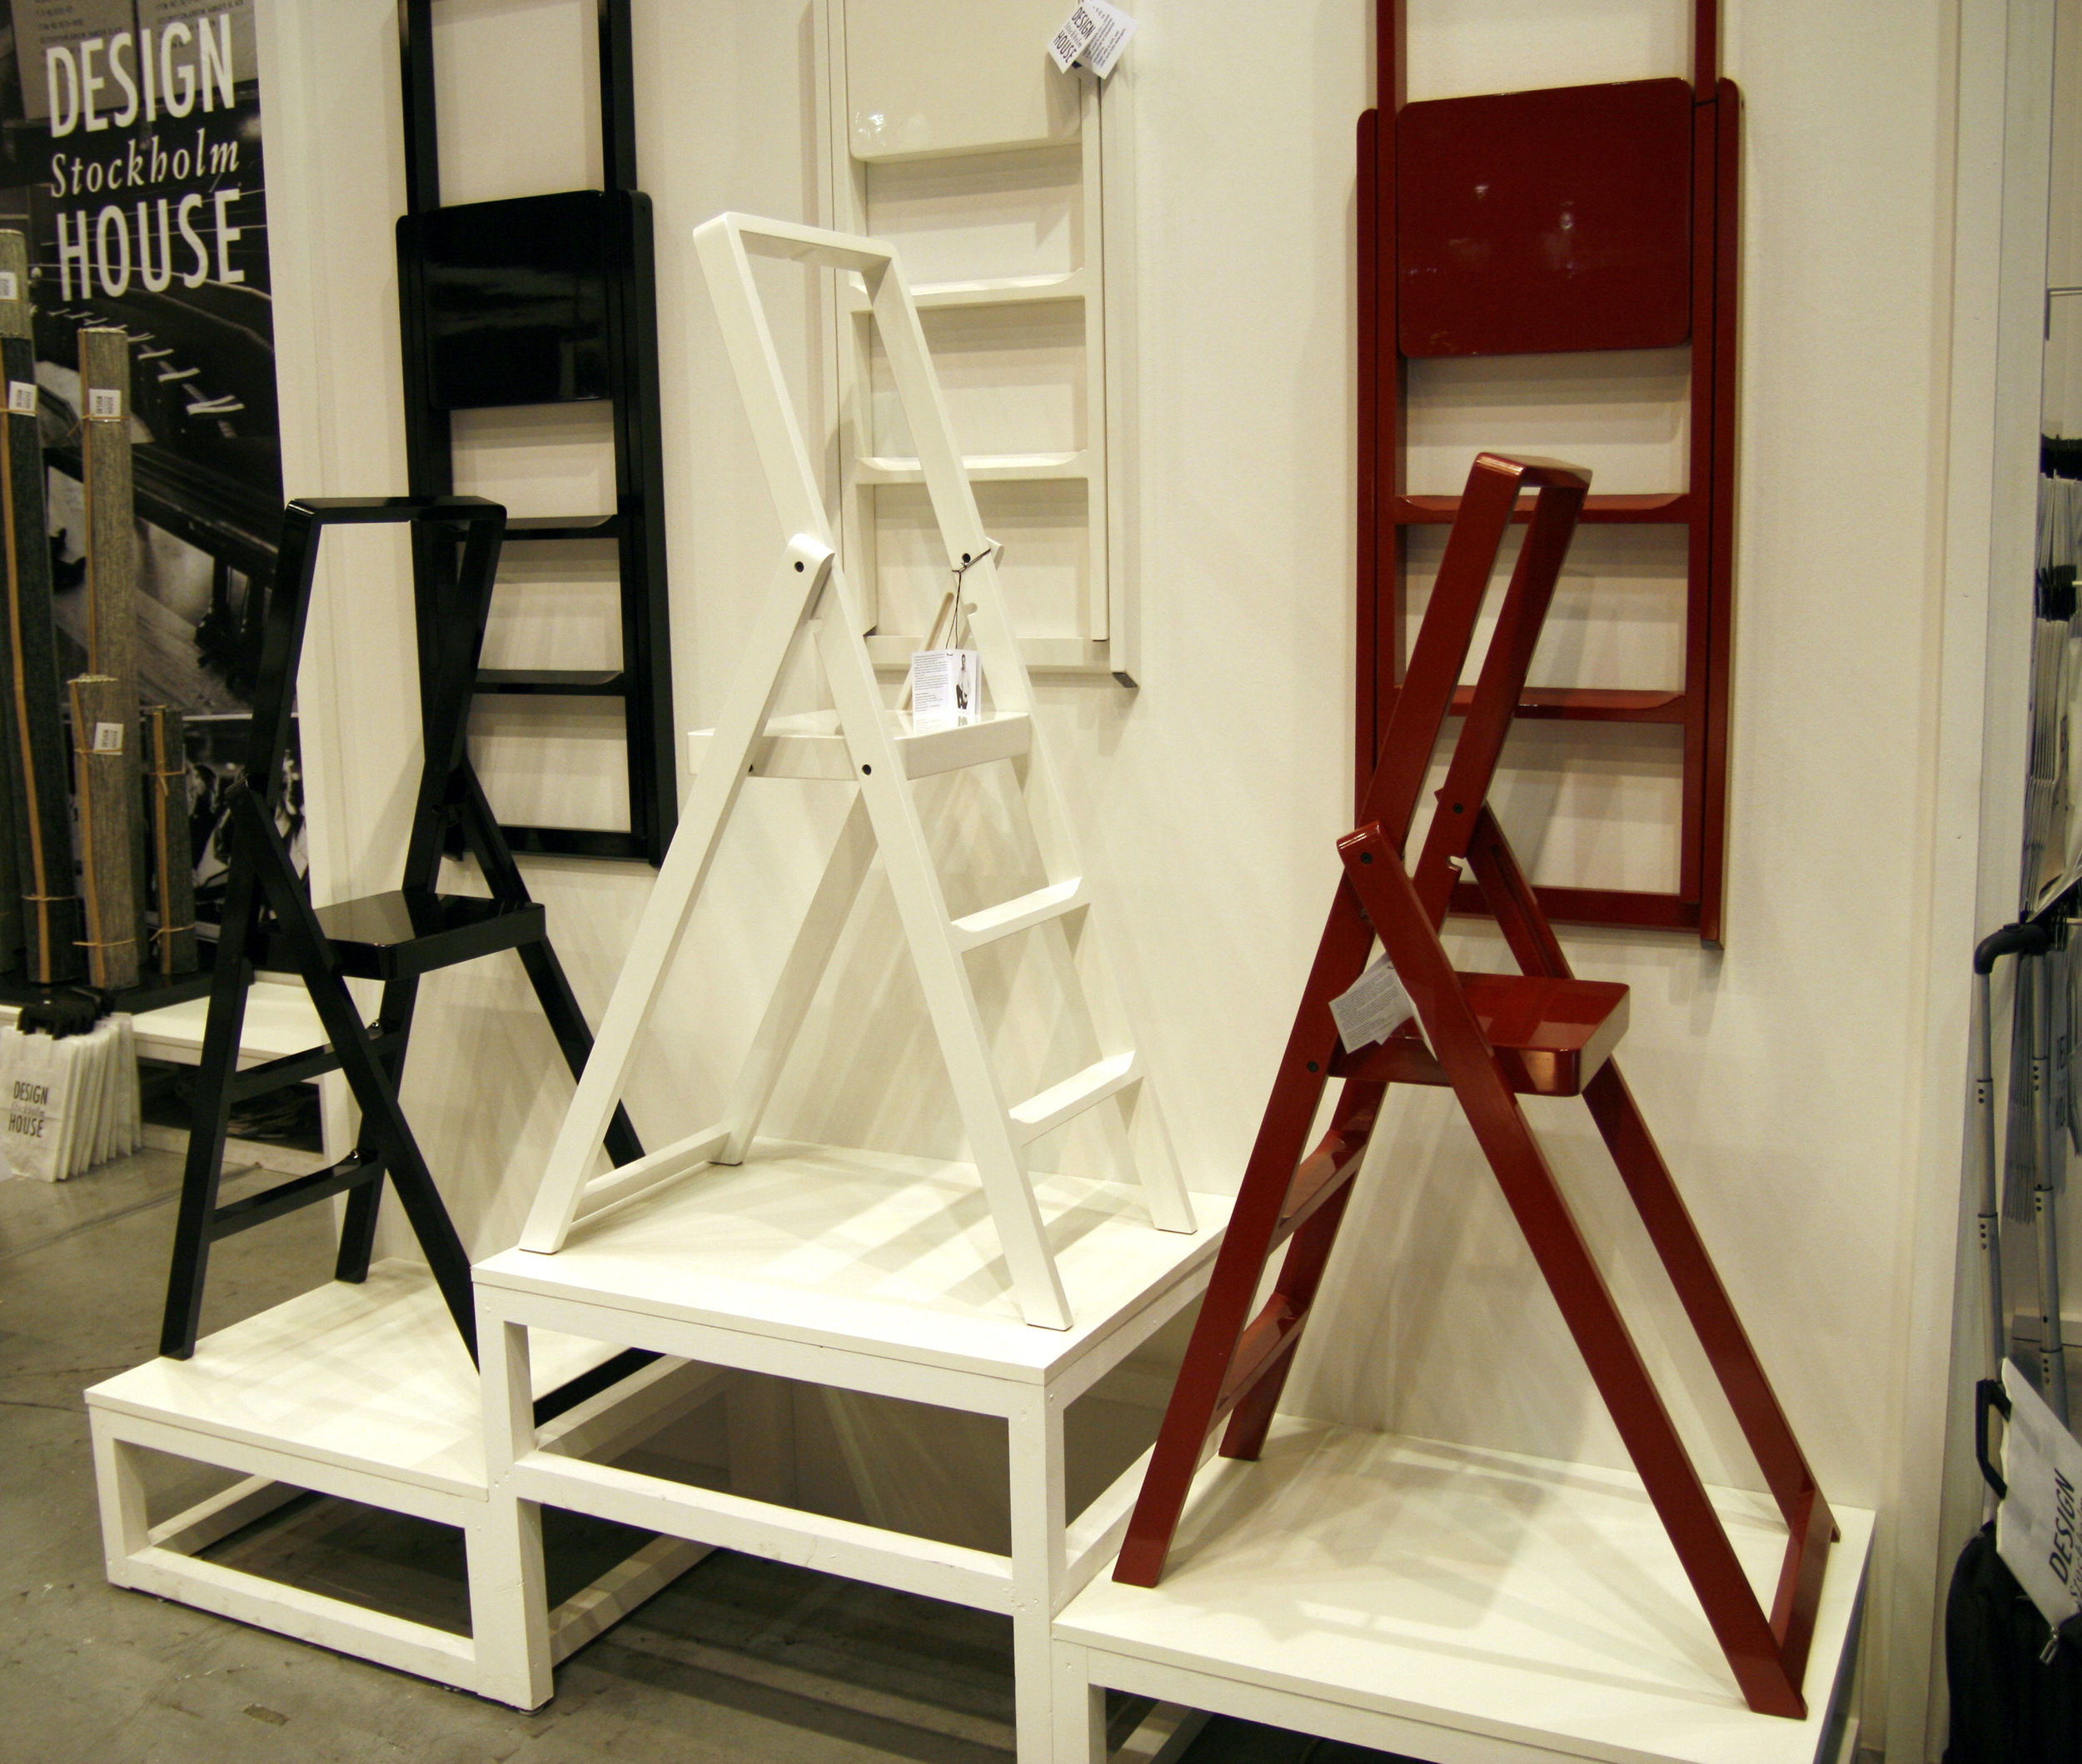 escabeau step pliable blanc design house stockholm. Black Bedroom Furniture Sets. Home Design Ideas